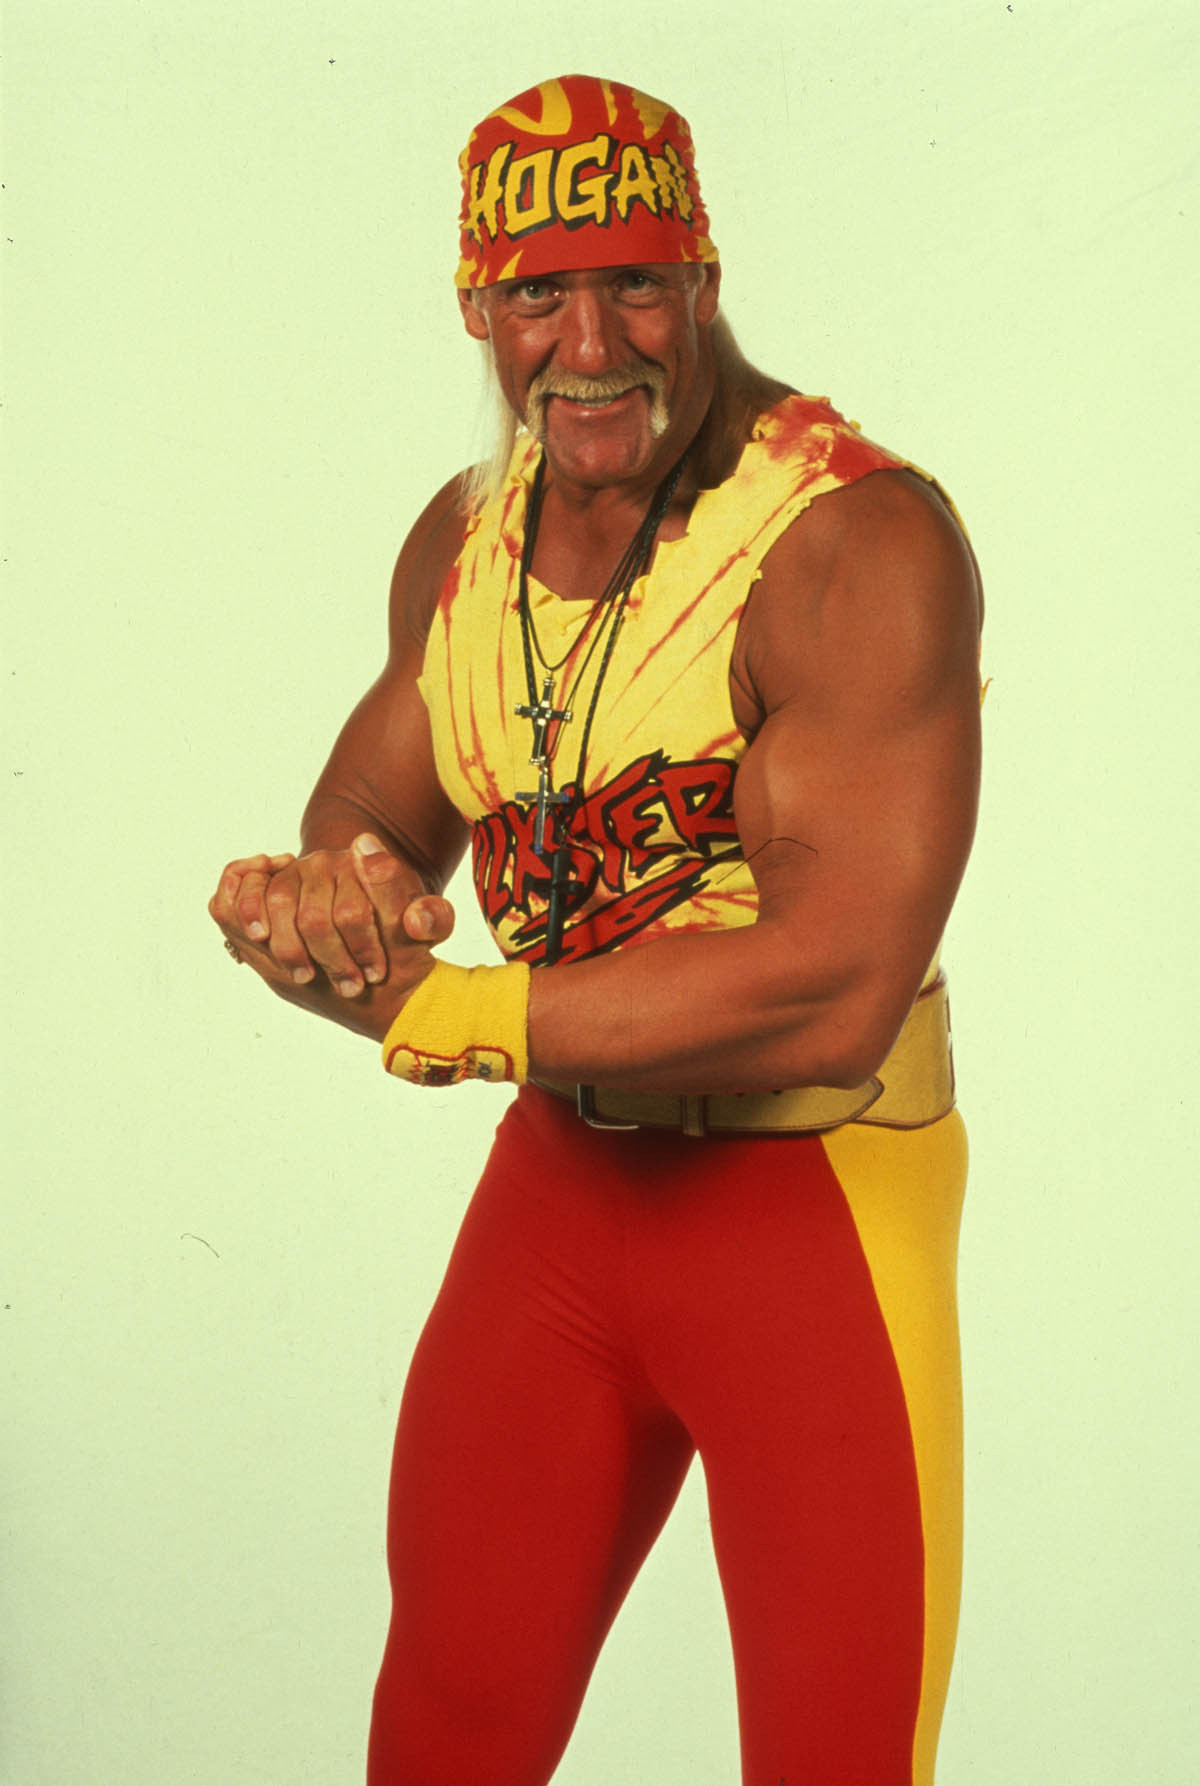 WWE Hall of Famer Hulk Hogan (Photo: Business Wire)